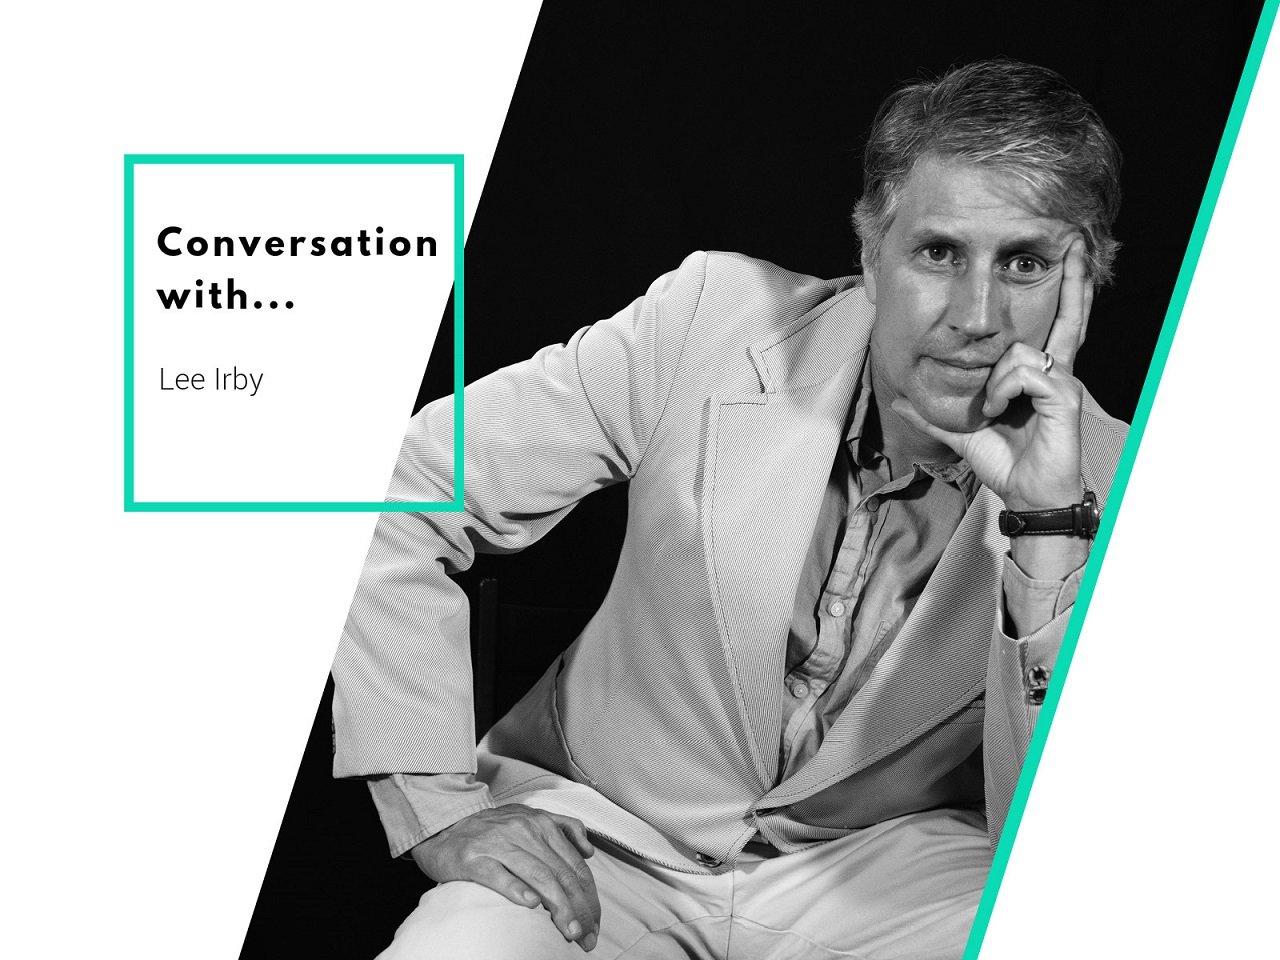 lee irby author interview conversation mystery thriller